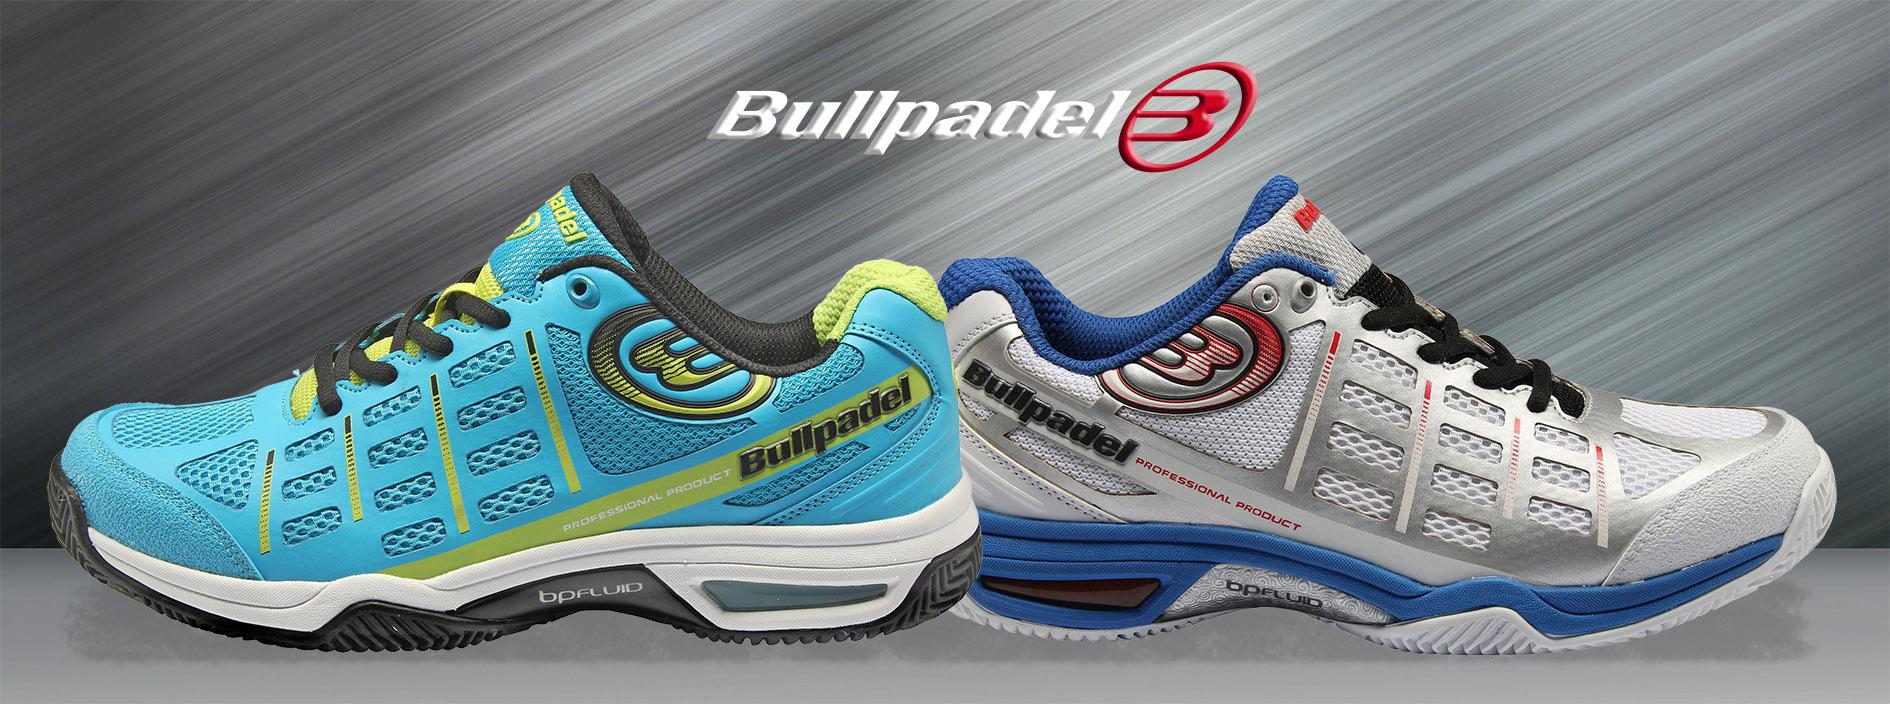 bd7446b205d Zapatillas de pádel Bullpadel  sus mejores modelos